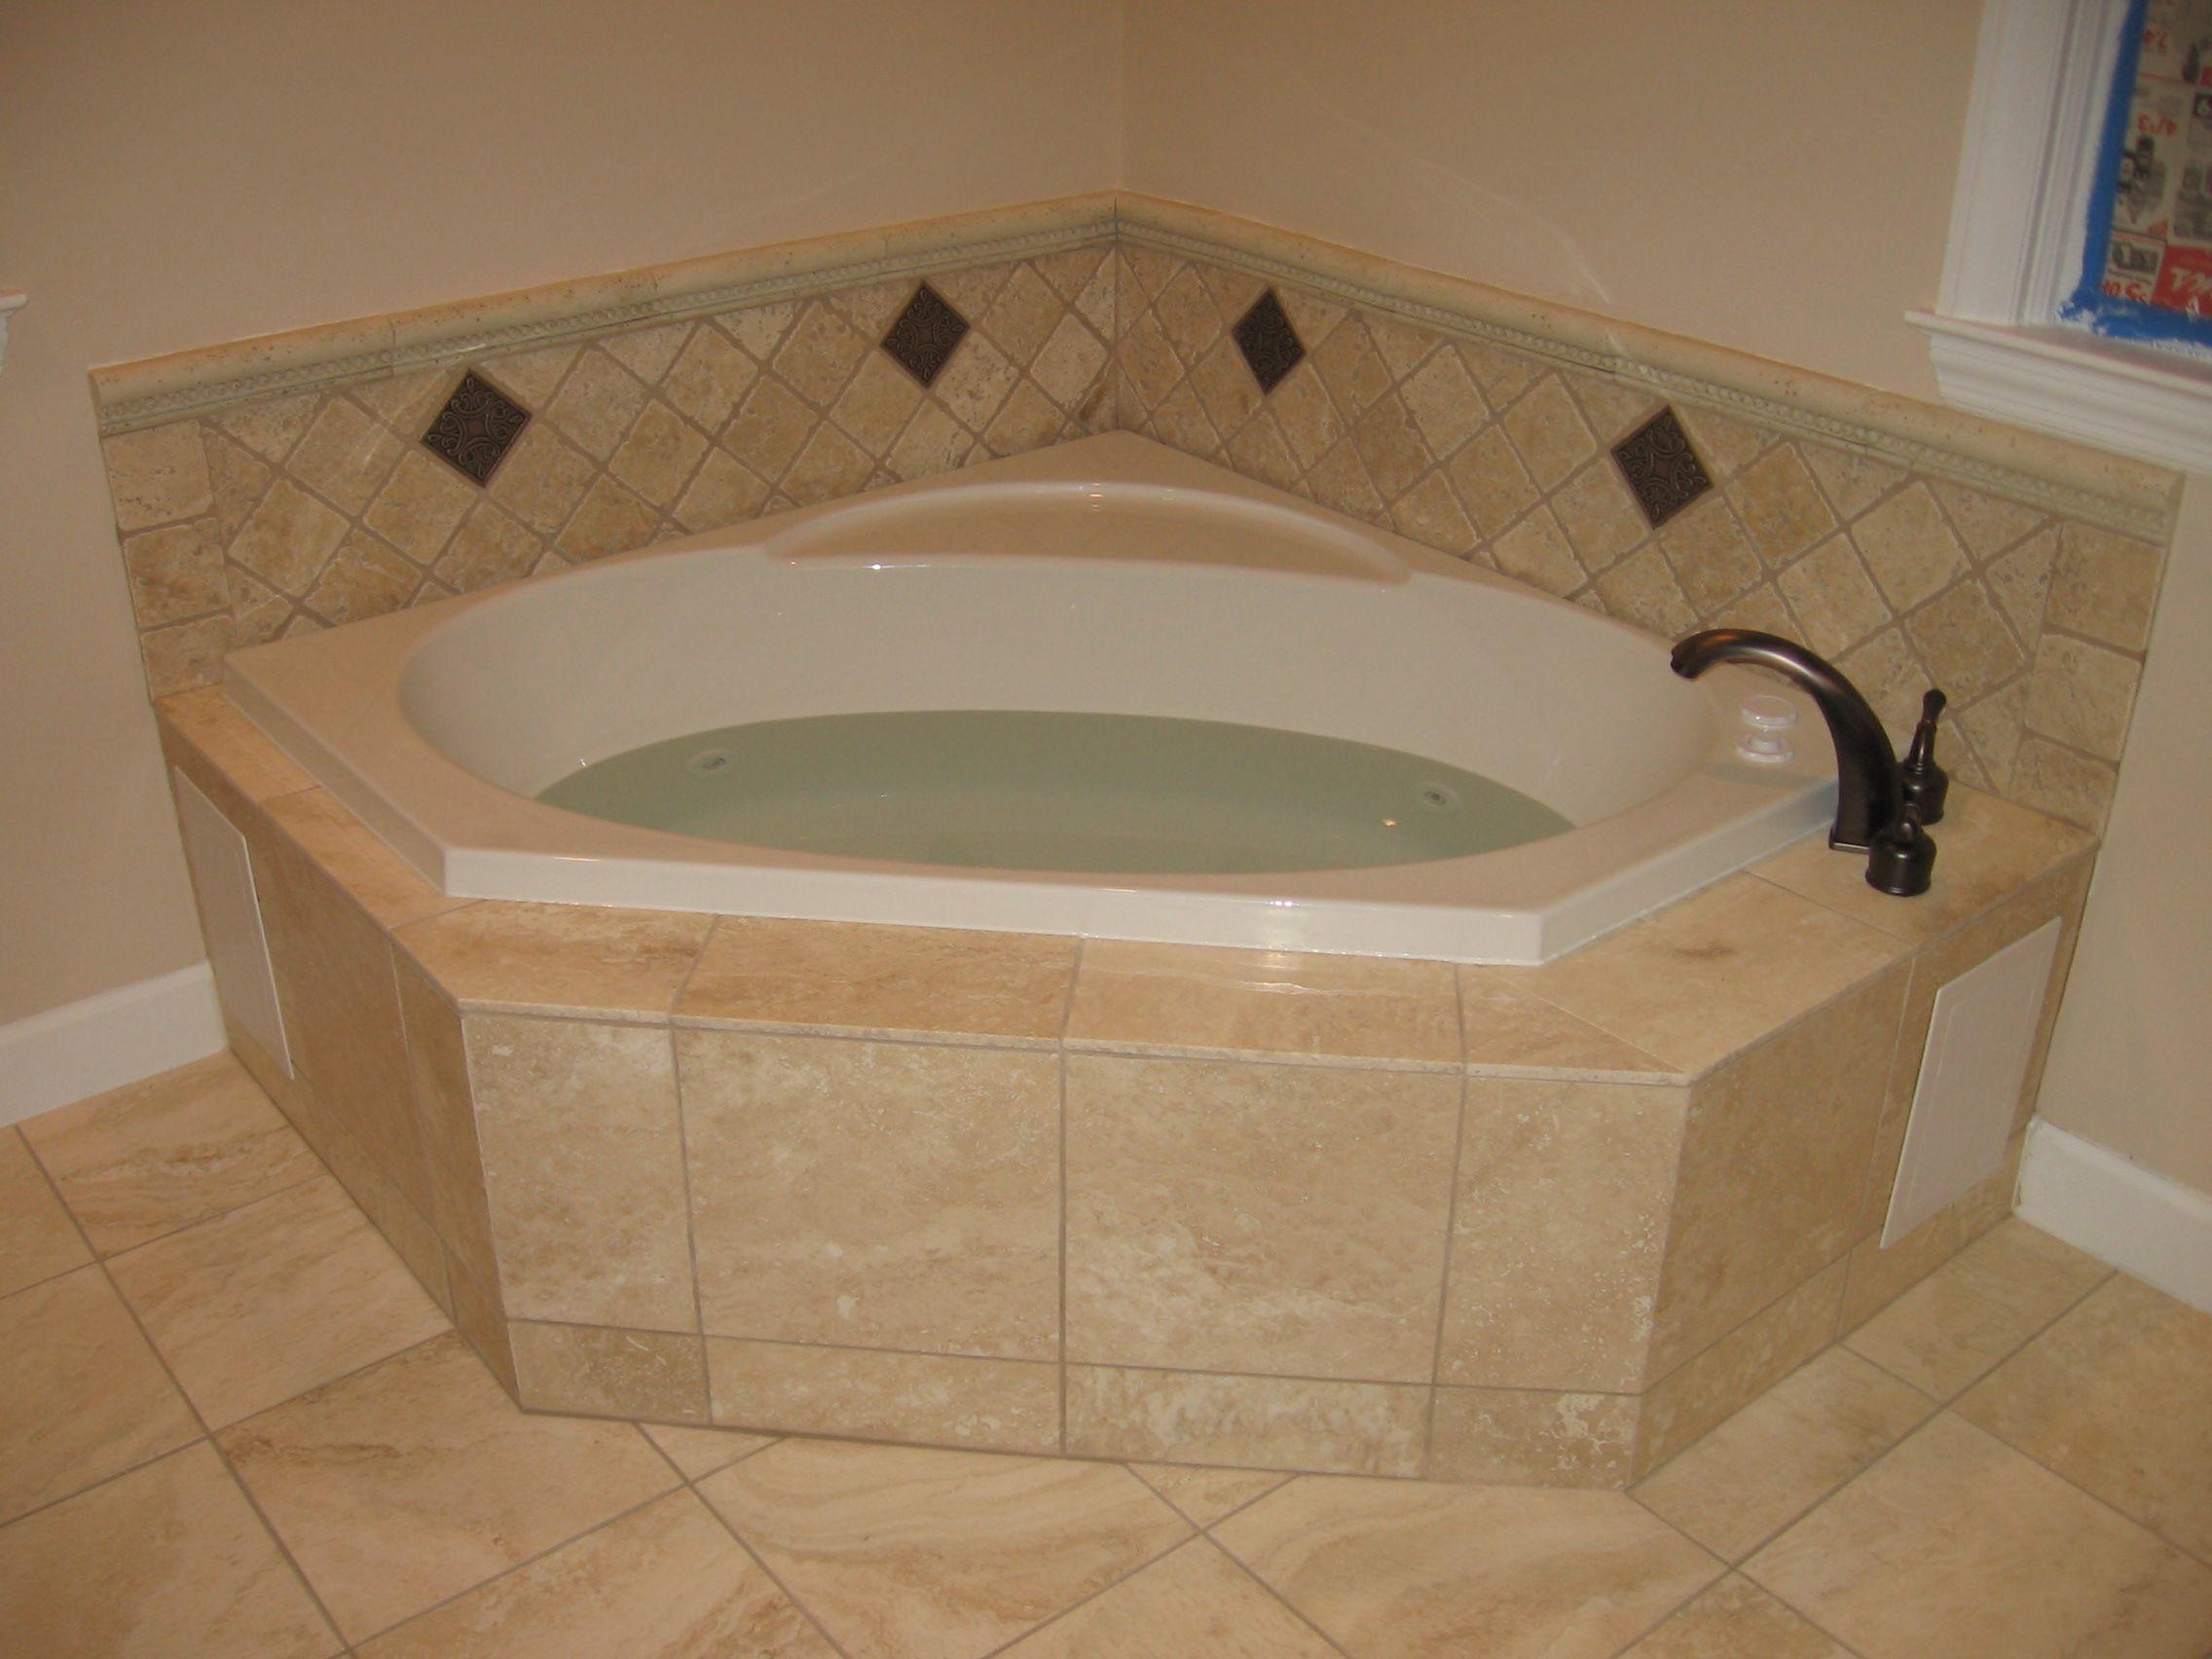 15 Interesting Whirlpool Corner Bathtub Picture Ideas Corner Tub